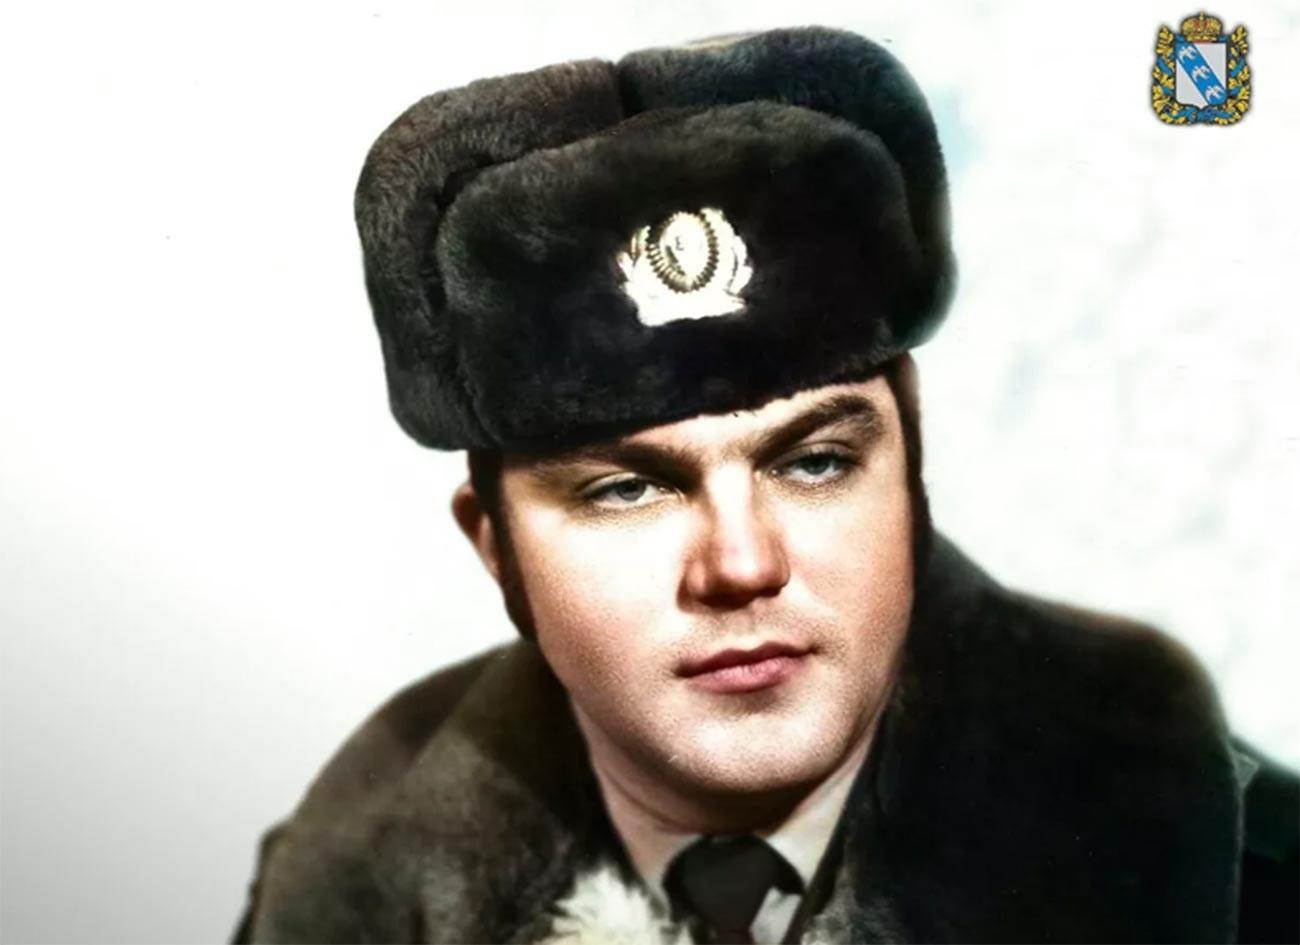 Mikhaïl Pankrouchev